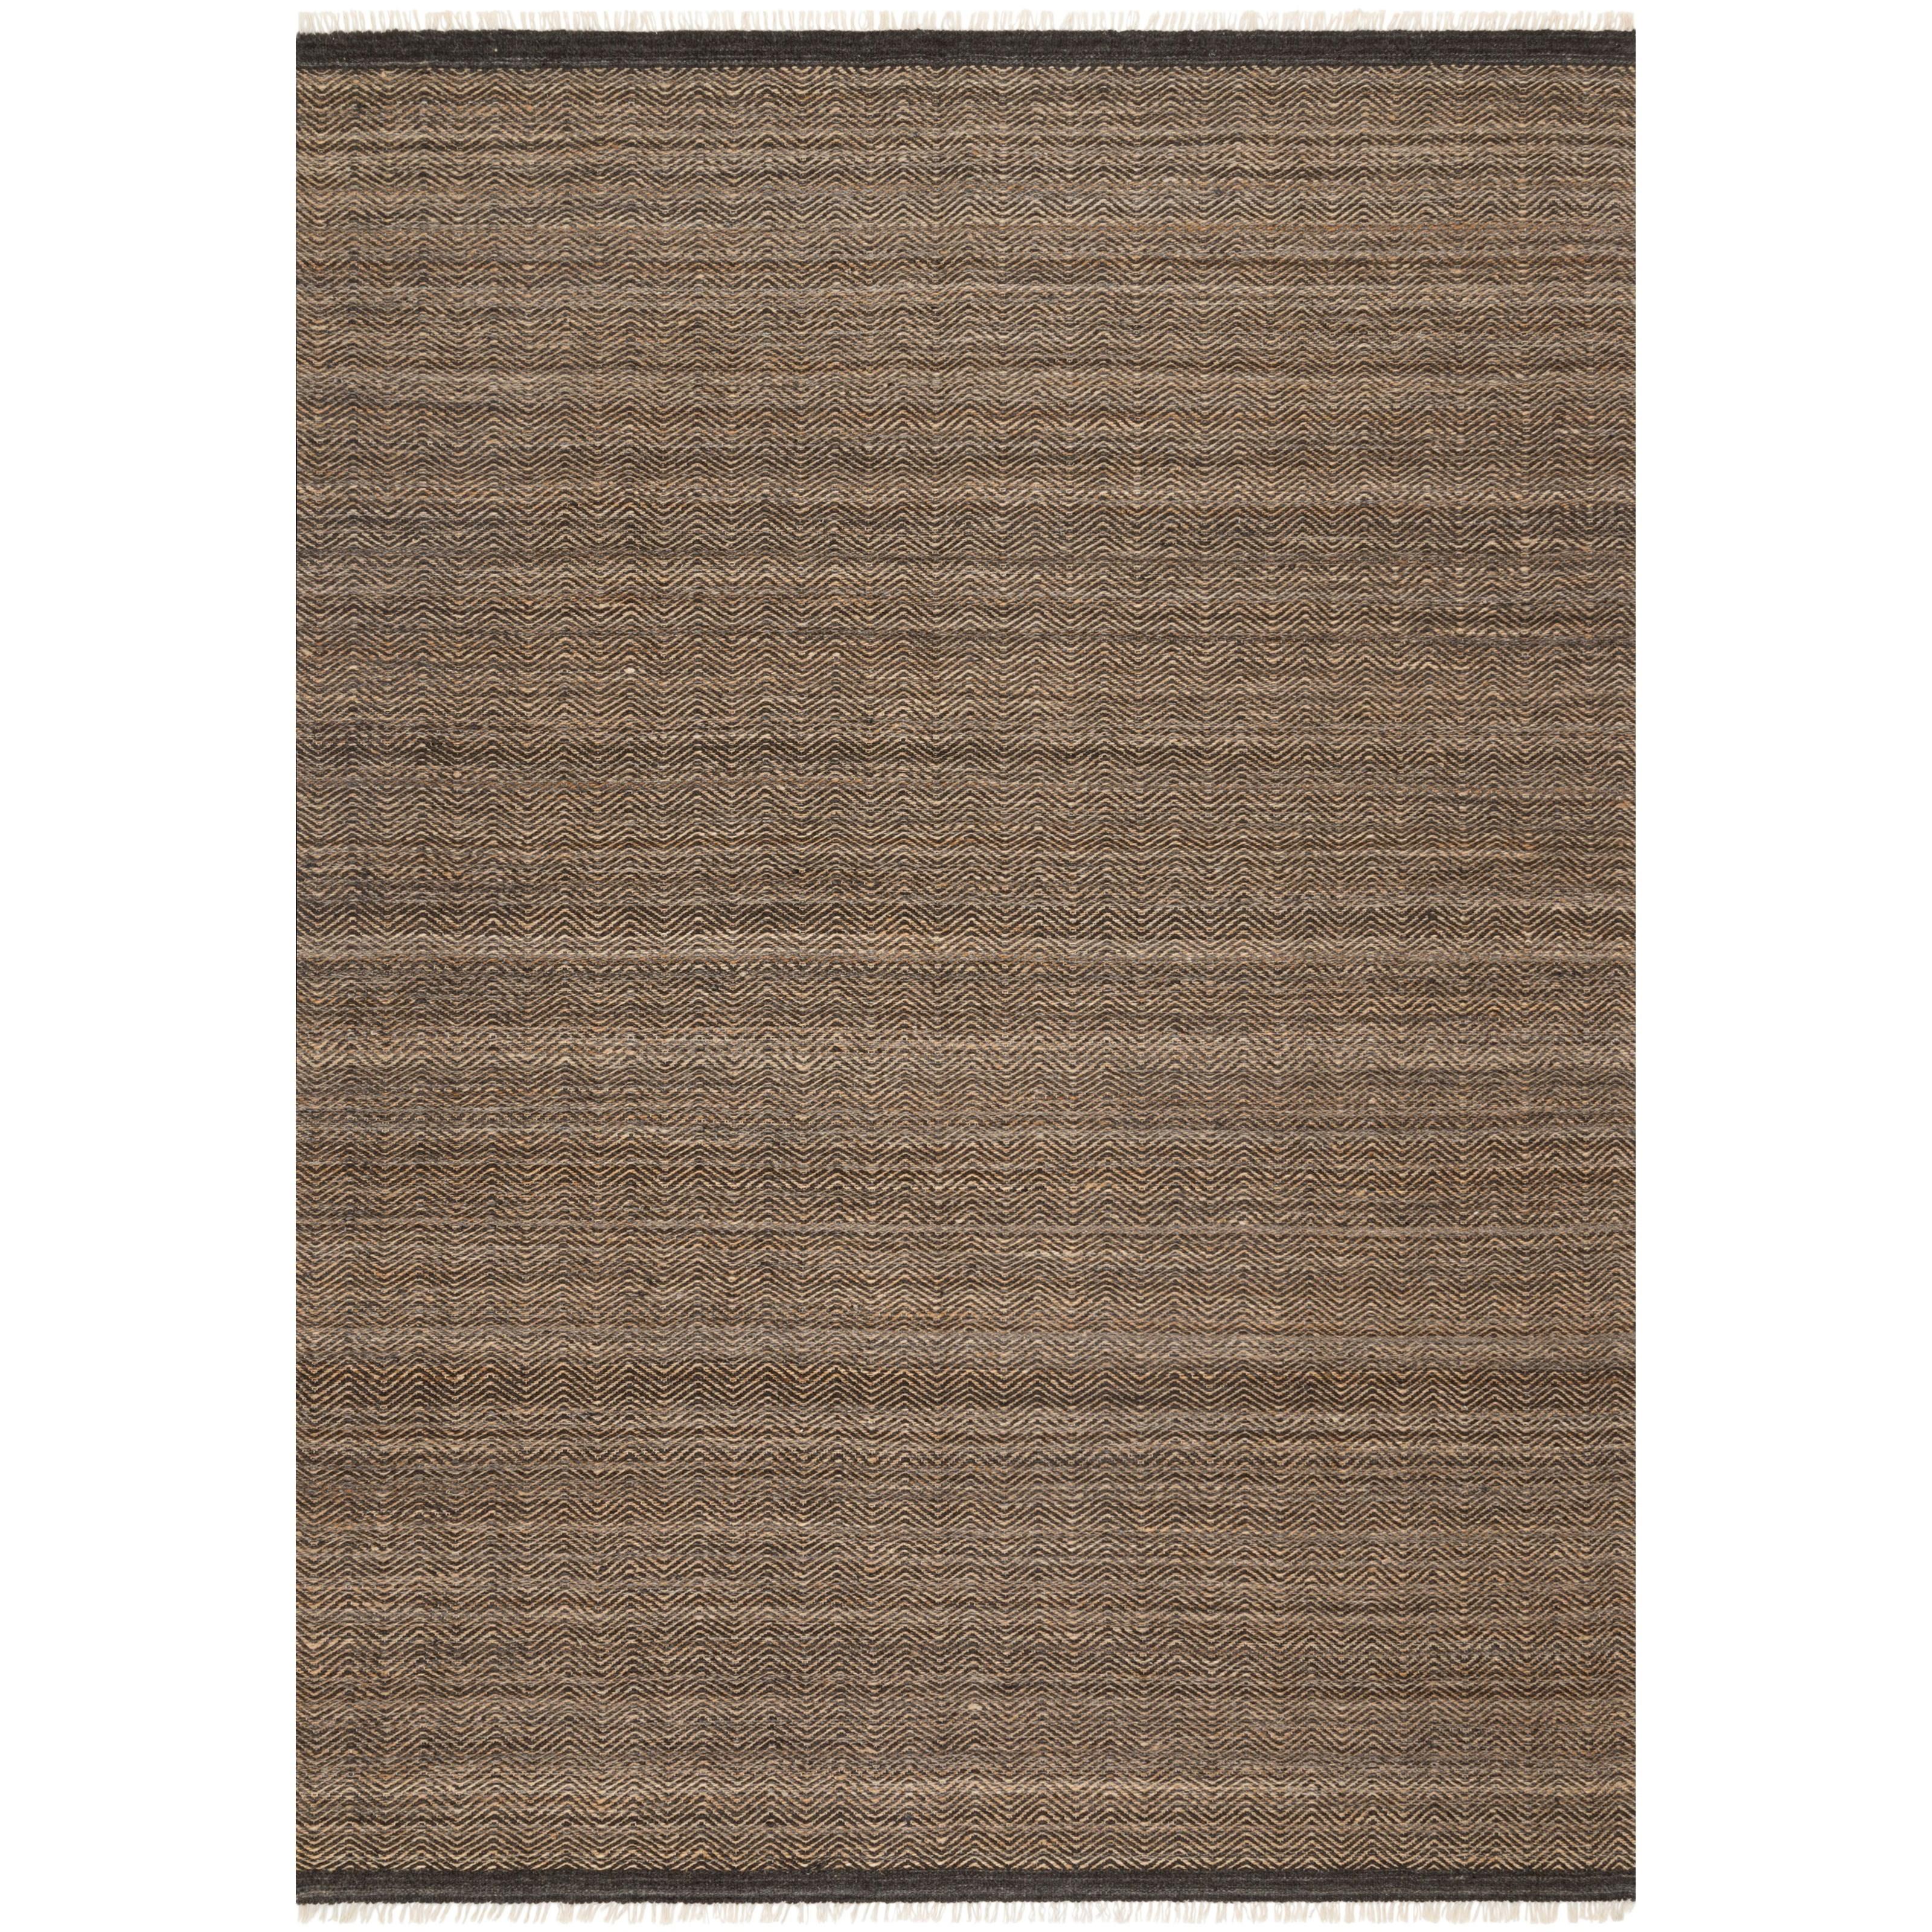 "Omen 5'0"" x 7'6"" Mocha Rug by Loloi Rugs at Sprintz Furniture"